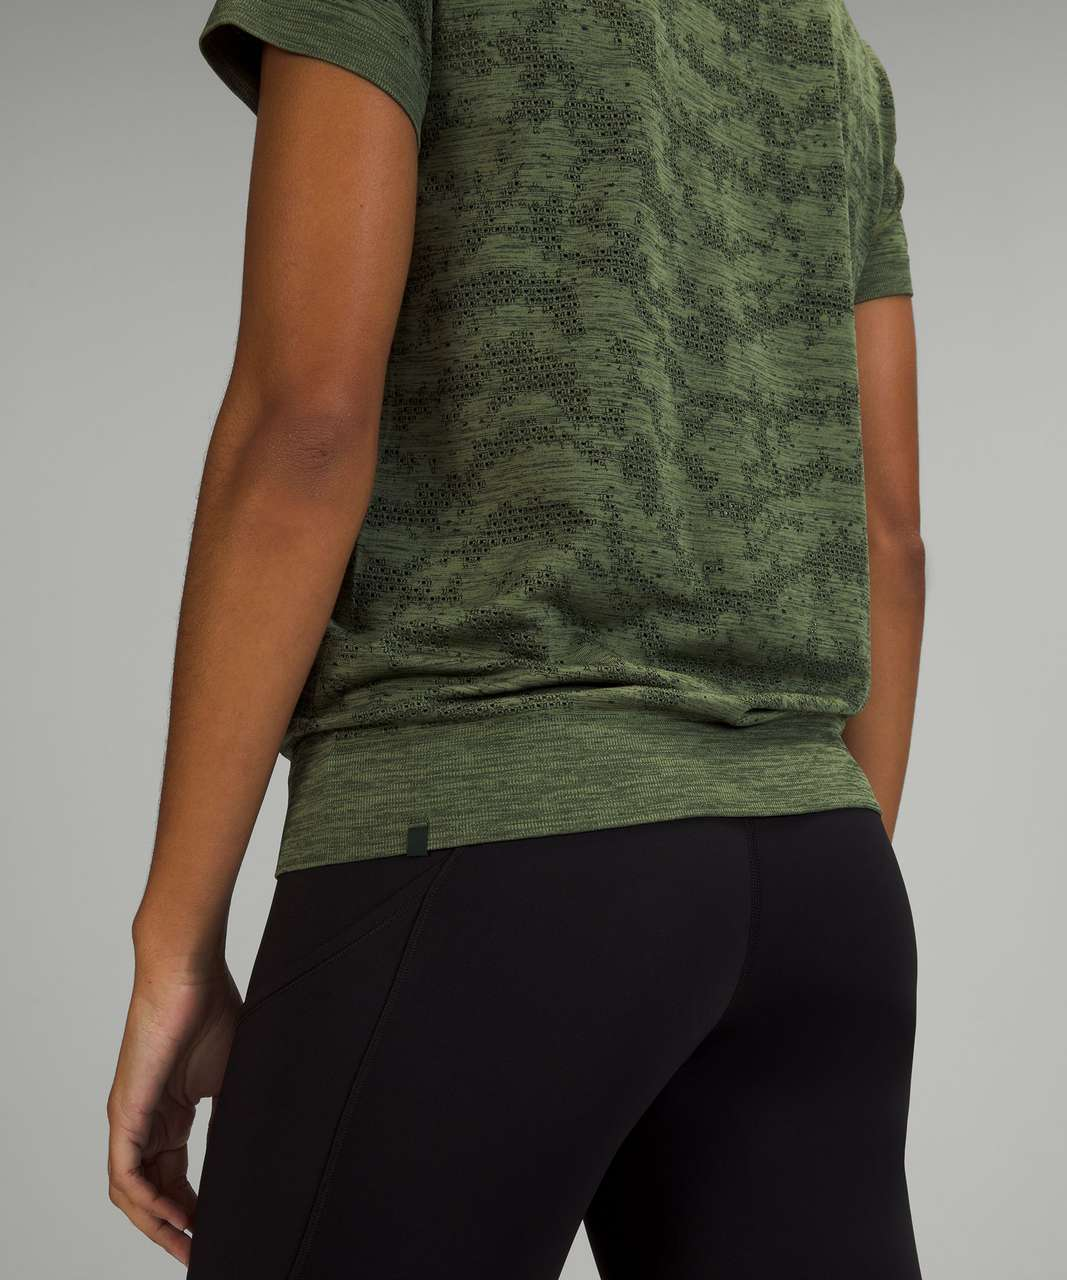 Lululemon Swiftly Breathe Short Sleeve Shirt - Dot Scape Rainforest Green / Green Twill